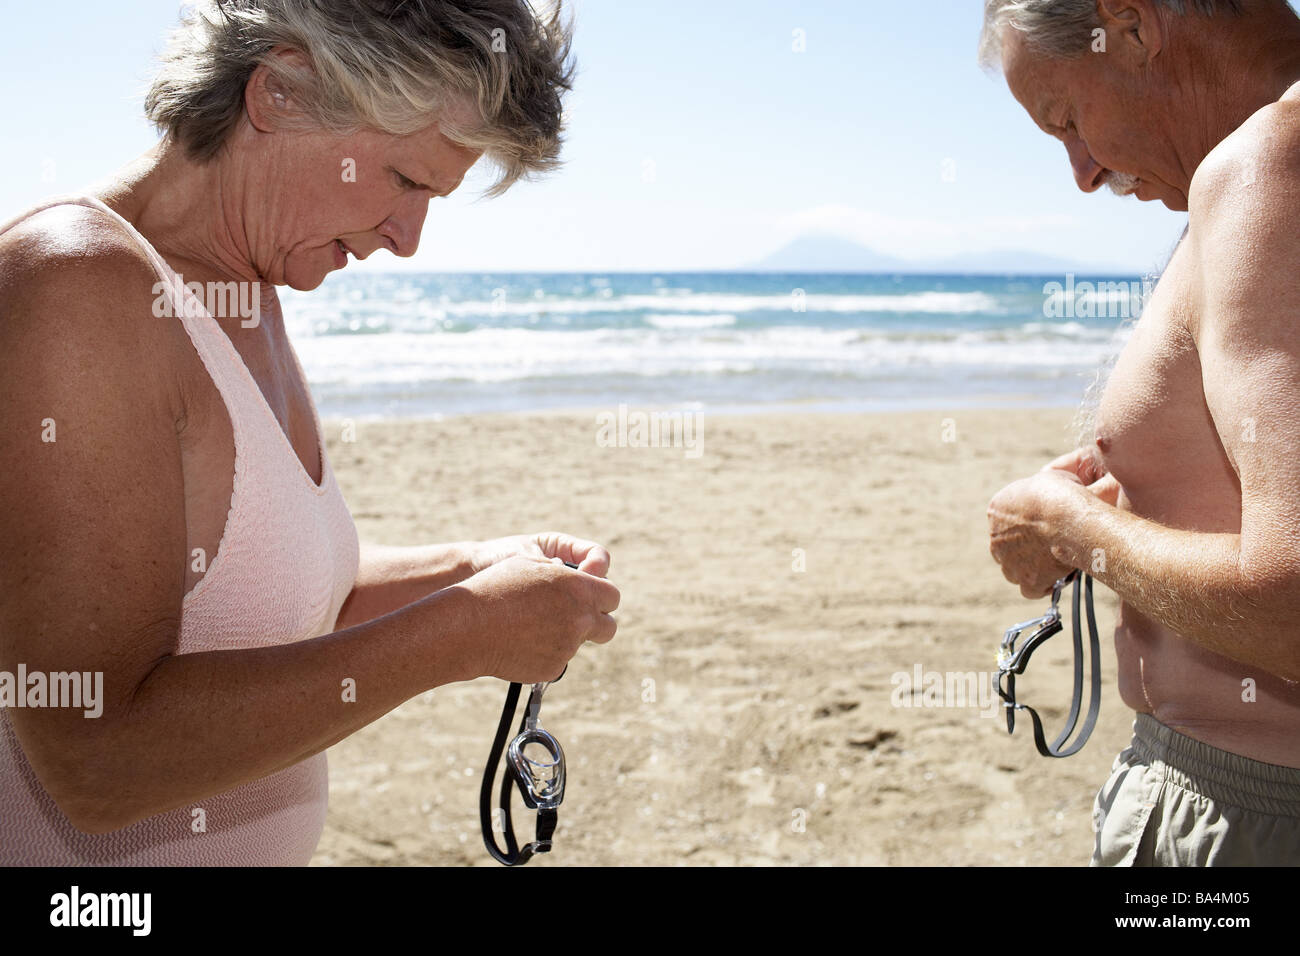 Beach senior-pair bath-clothing swimming-glasses side-portrait broached series people seniors pair 60-70 years beach - Stock Image